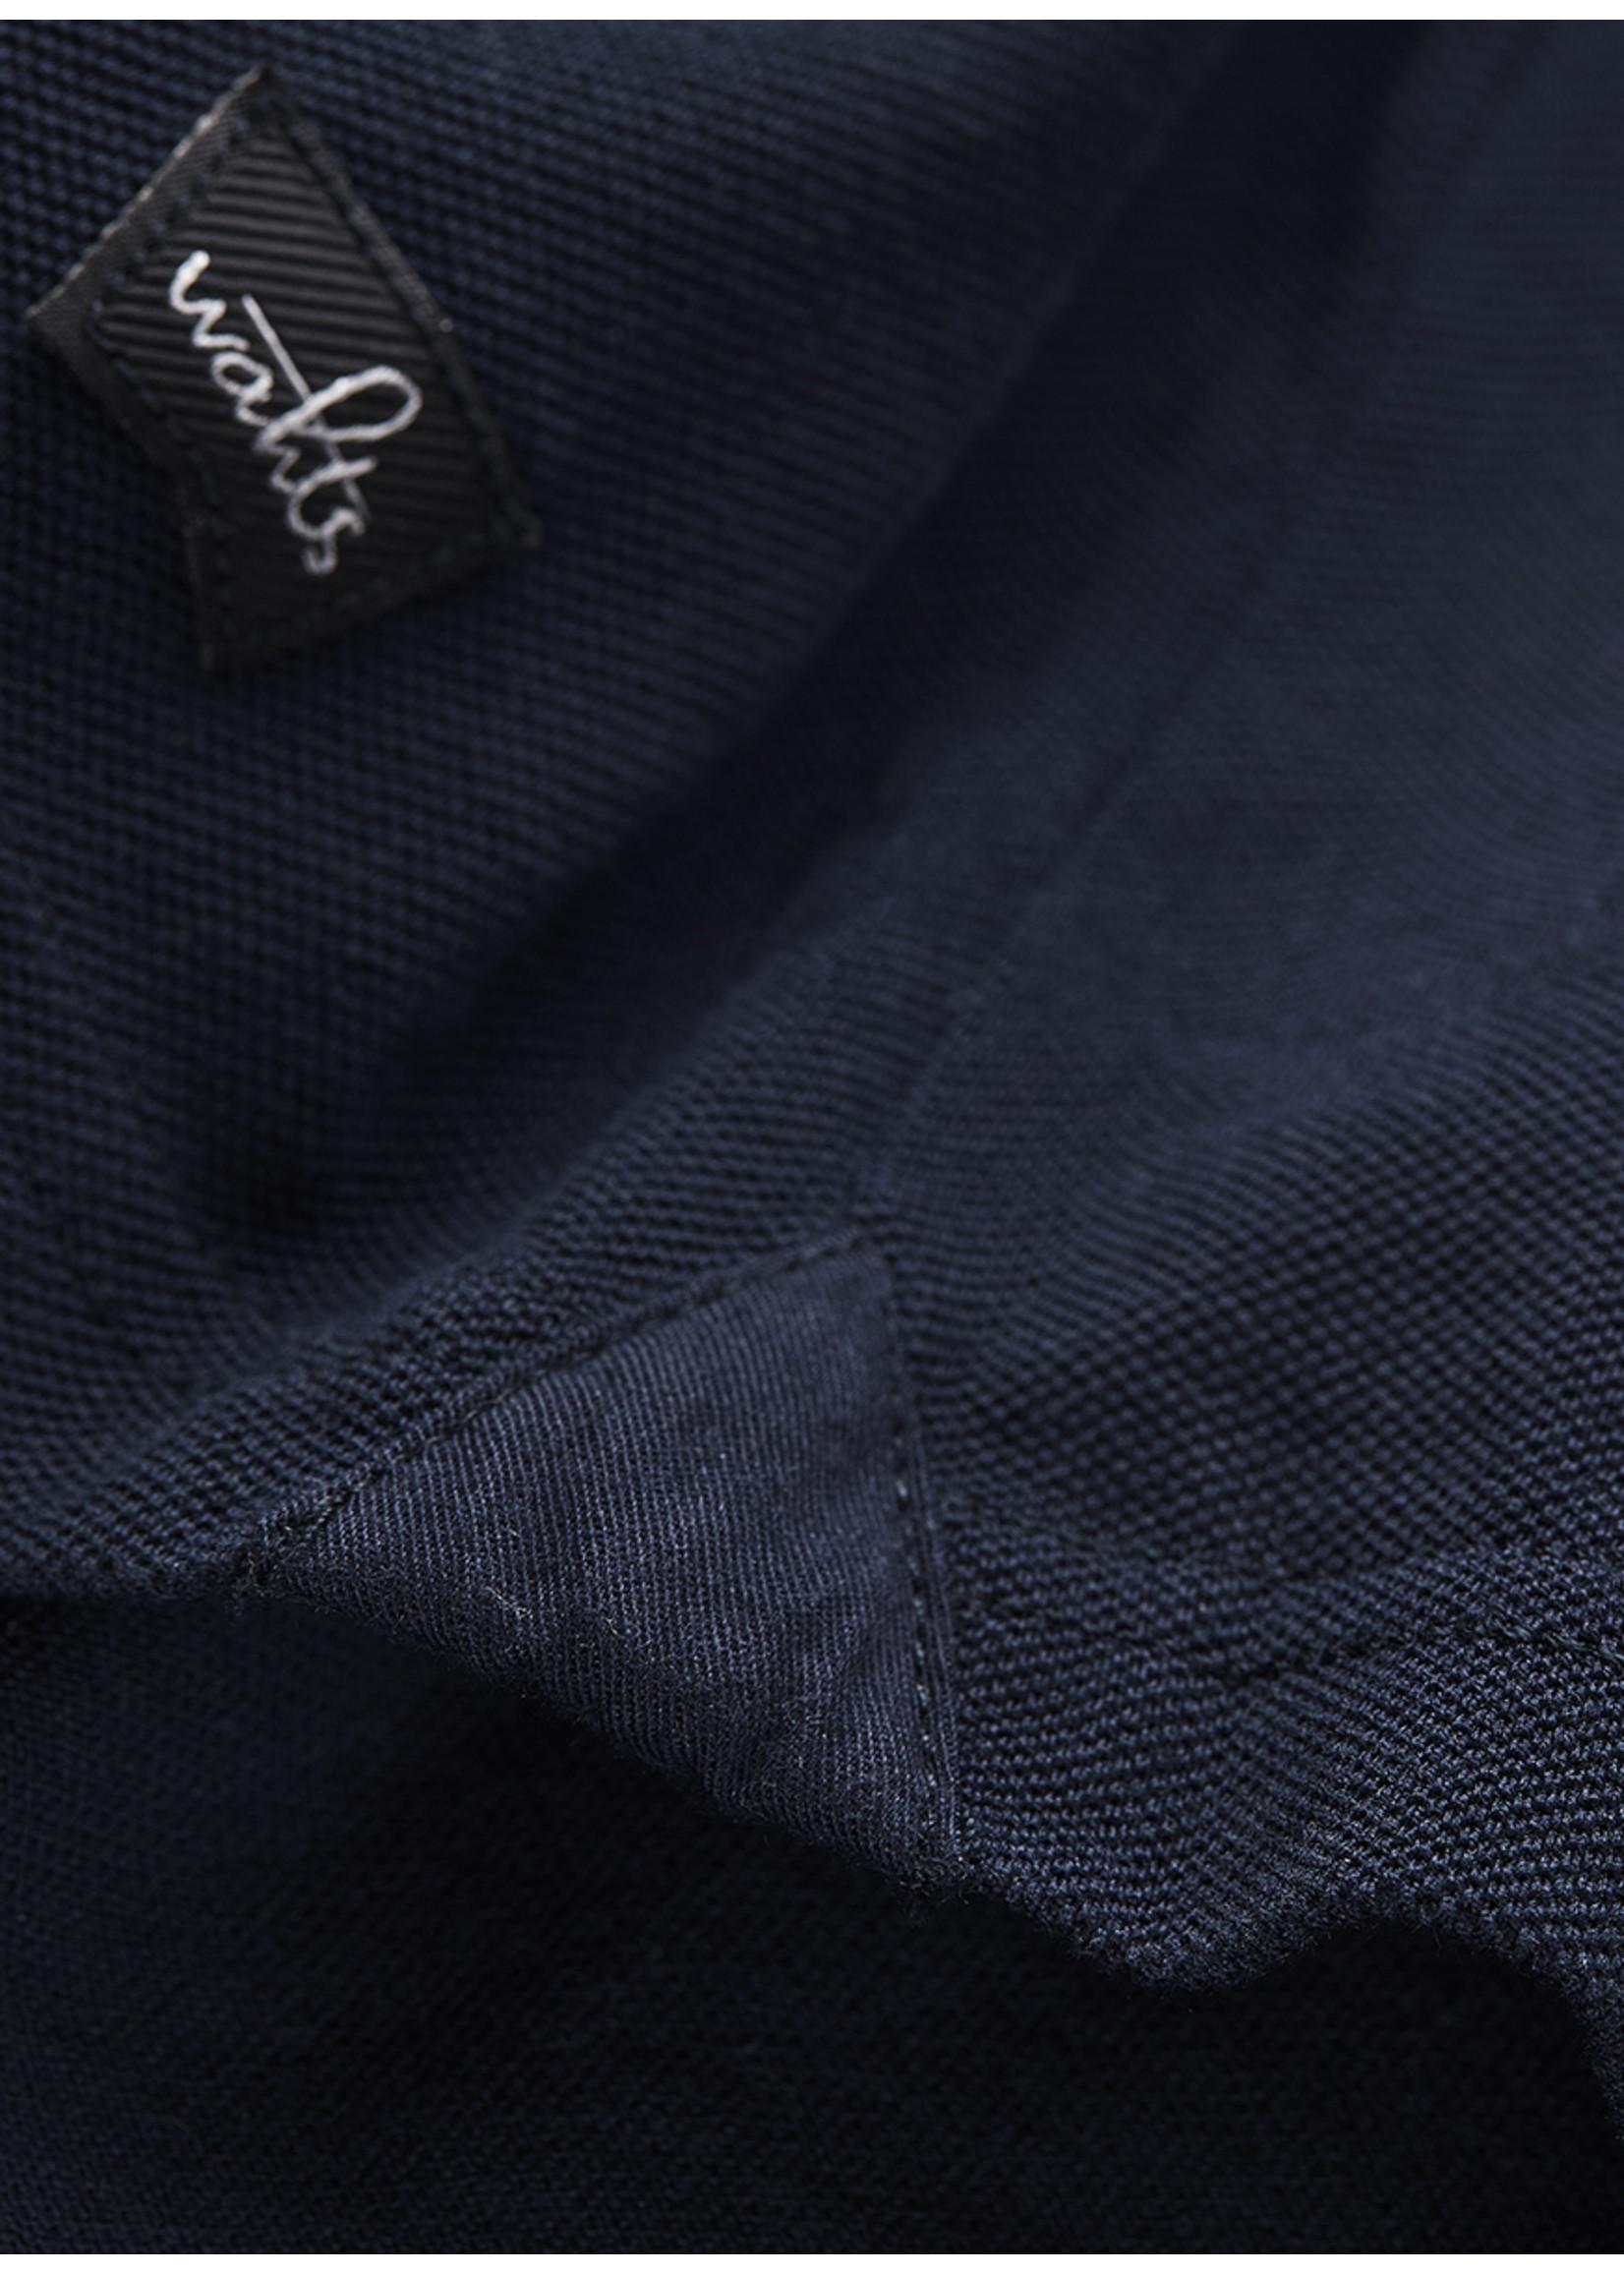 Wahts Davis tailored polo shirt navy blue